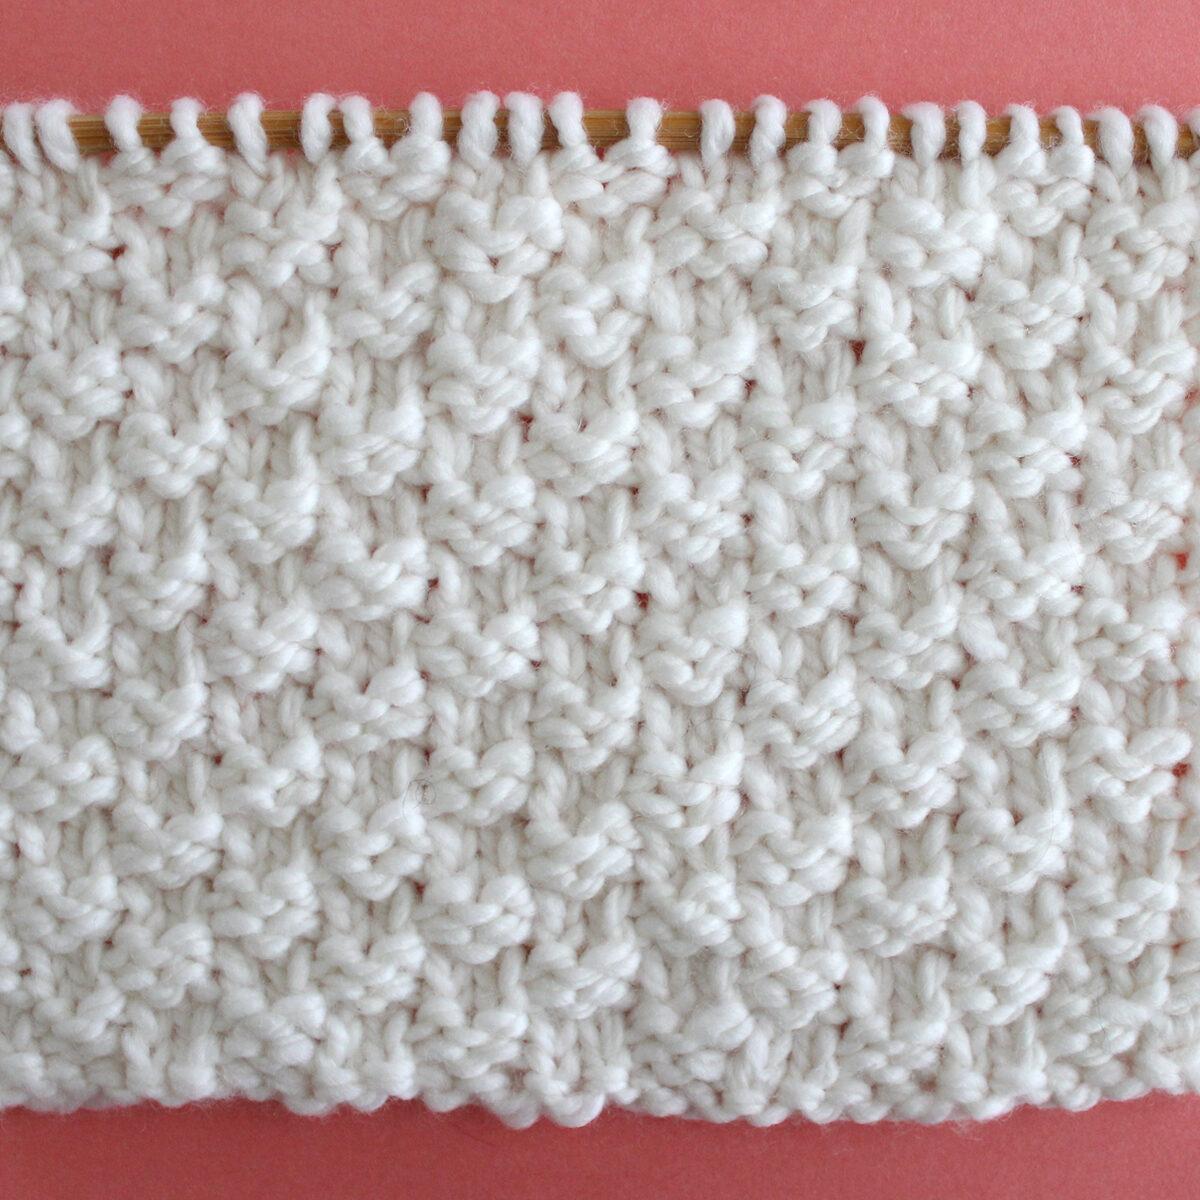 Double Moss Knit Stitch Pattern in white yarn on knitting needle.